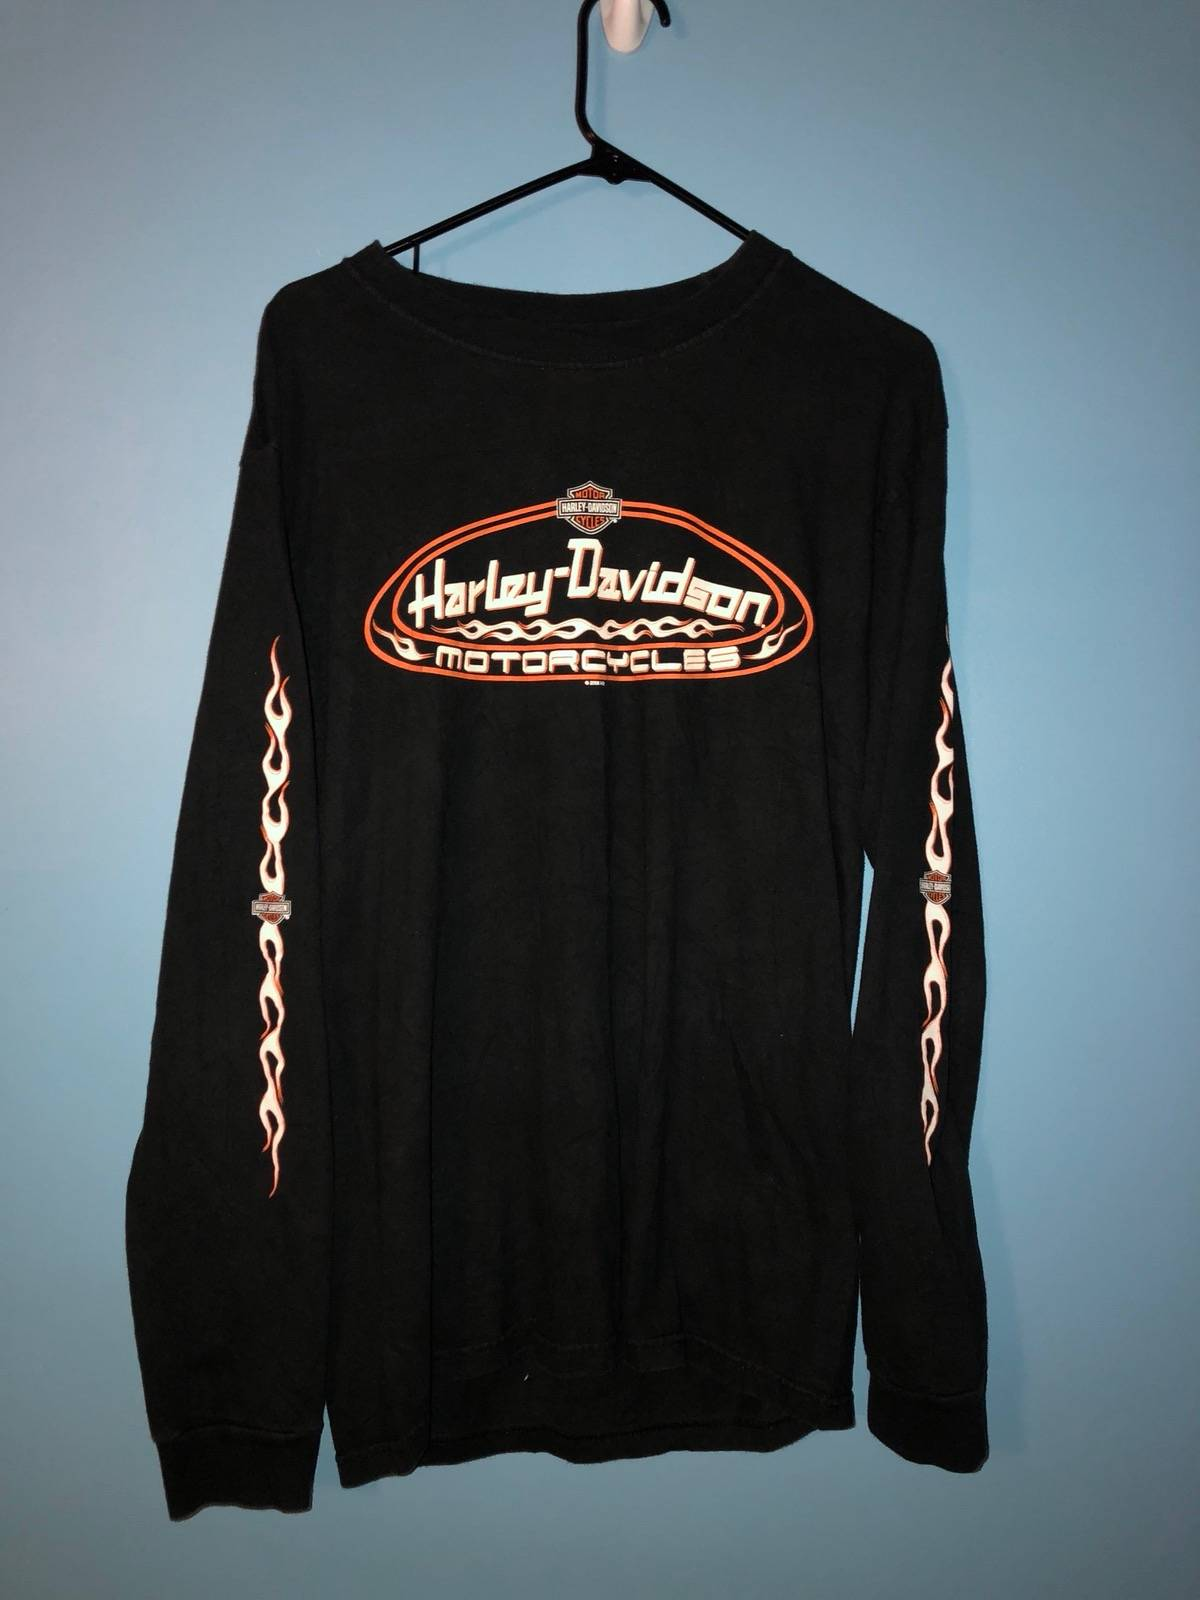 Harley Davidson Vintage Harley Tee Corpus Christi Size M Long